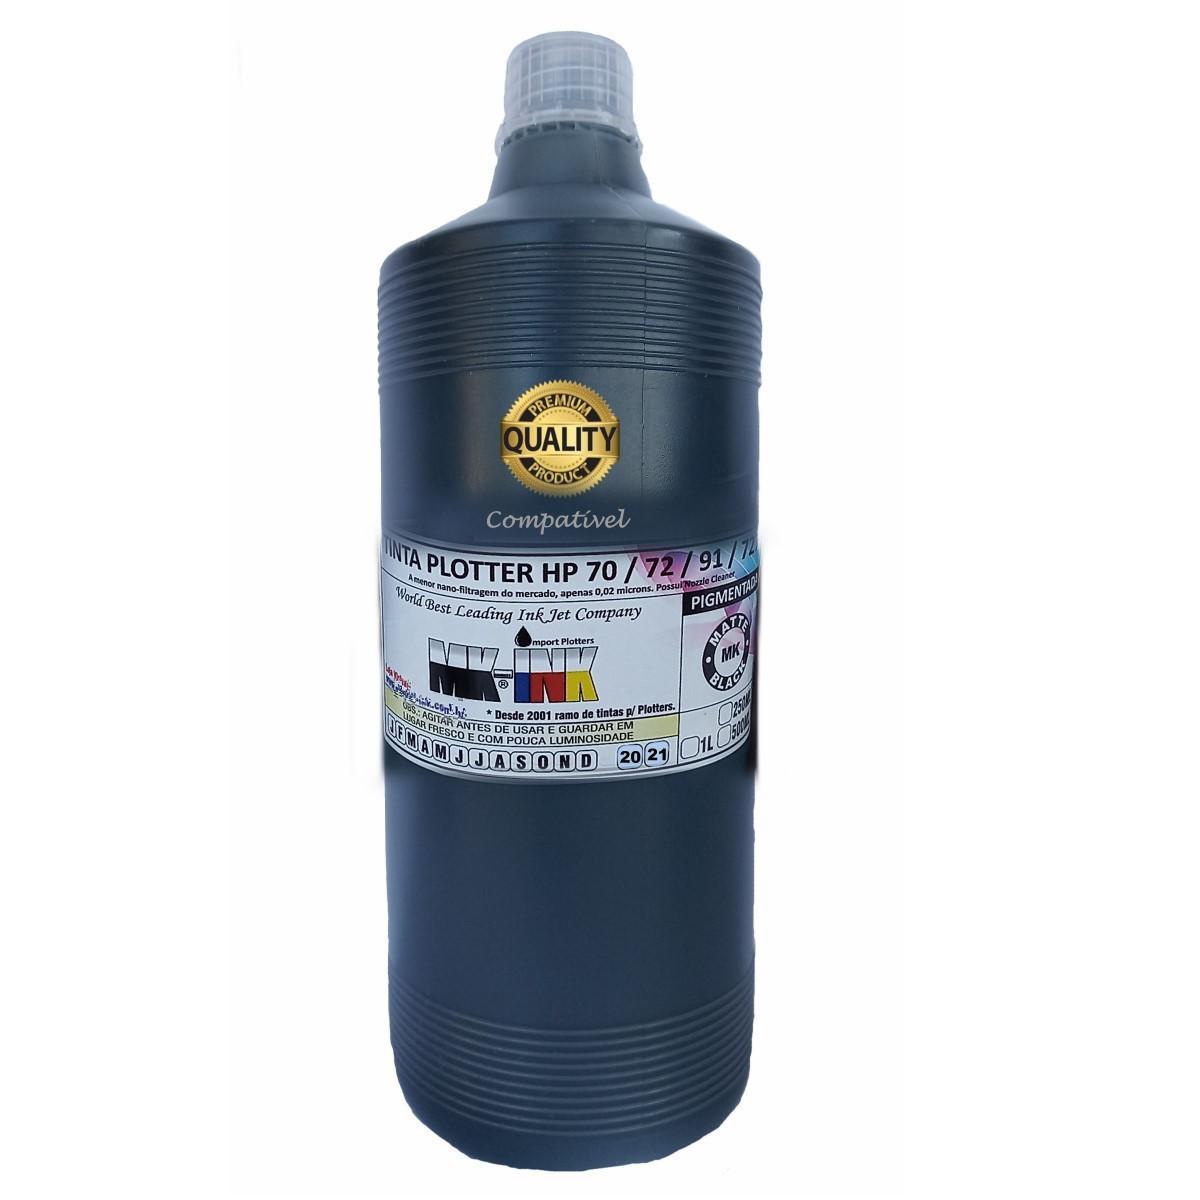 Tinta MK-Matte-Black Pigmentada Plotter HP dos cart. cod. HP72, HP70, HP91, HP727, HP771 veja os mod.